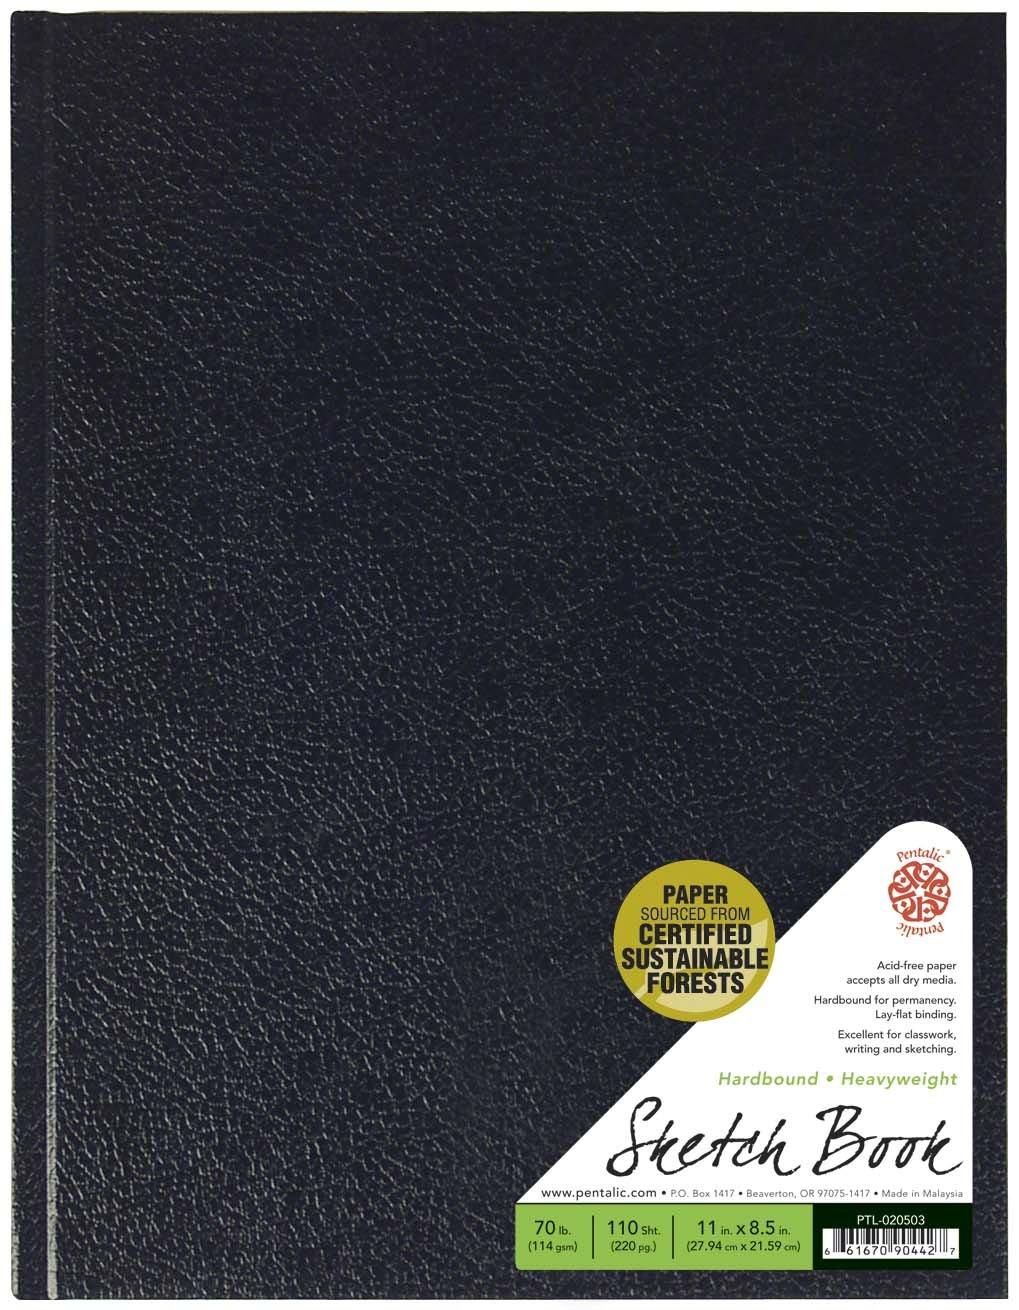 Pentalic Sketch Book, Hardbound, 8-1/2-Inch by 11-Inch by Pentalic